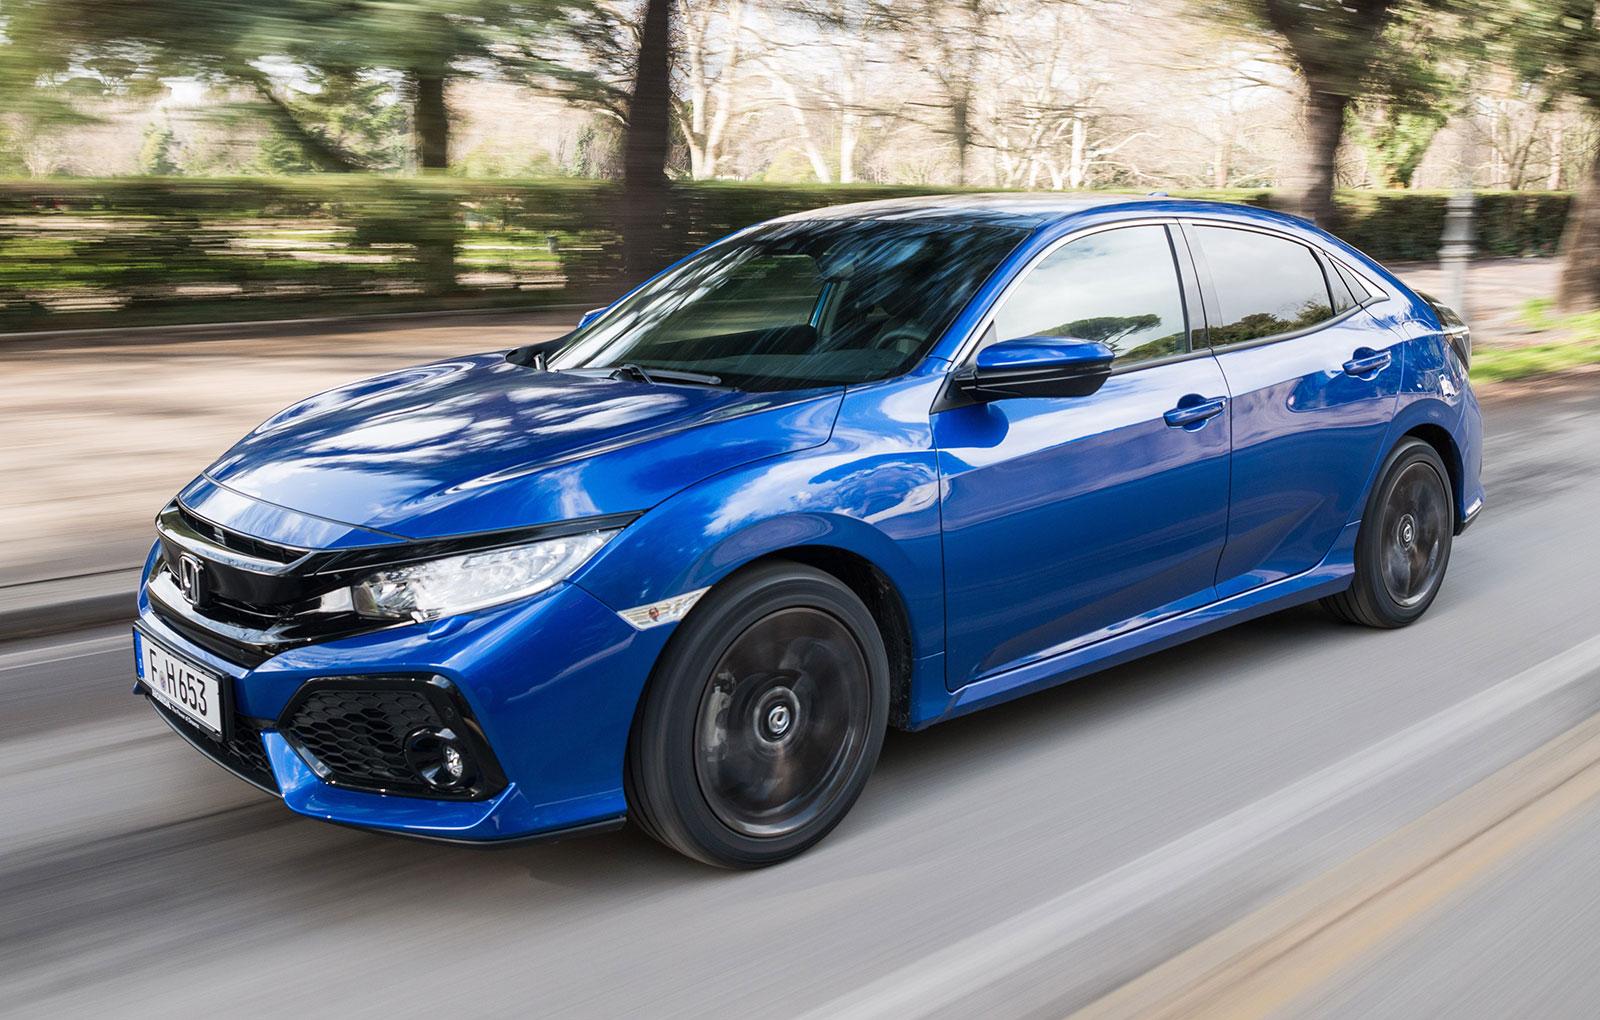 2019 honda civic sedan priced at 19 450 civic coupe starts from 20 650 autoevolution. Black Bedroom Furniture Sets. Home Design Ideas